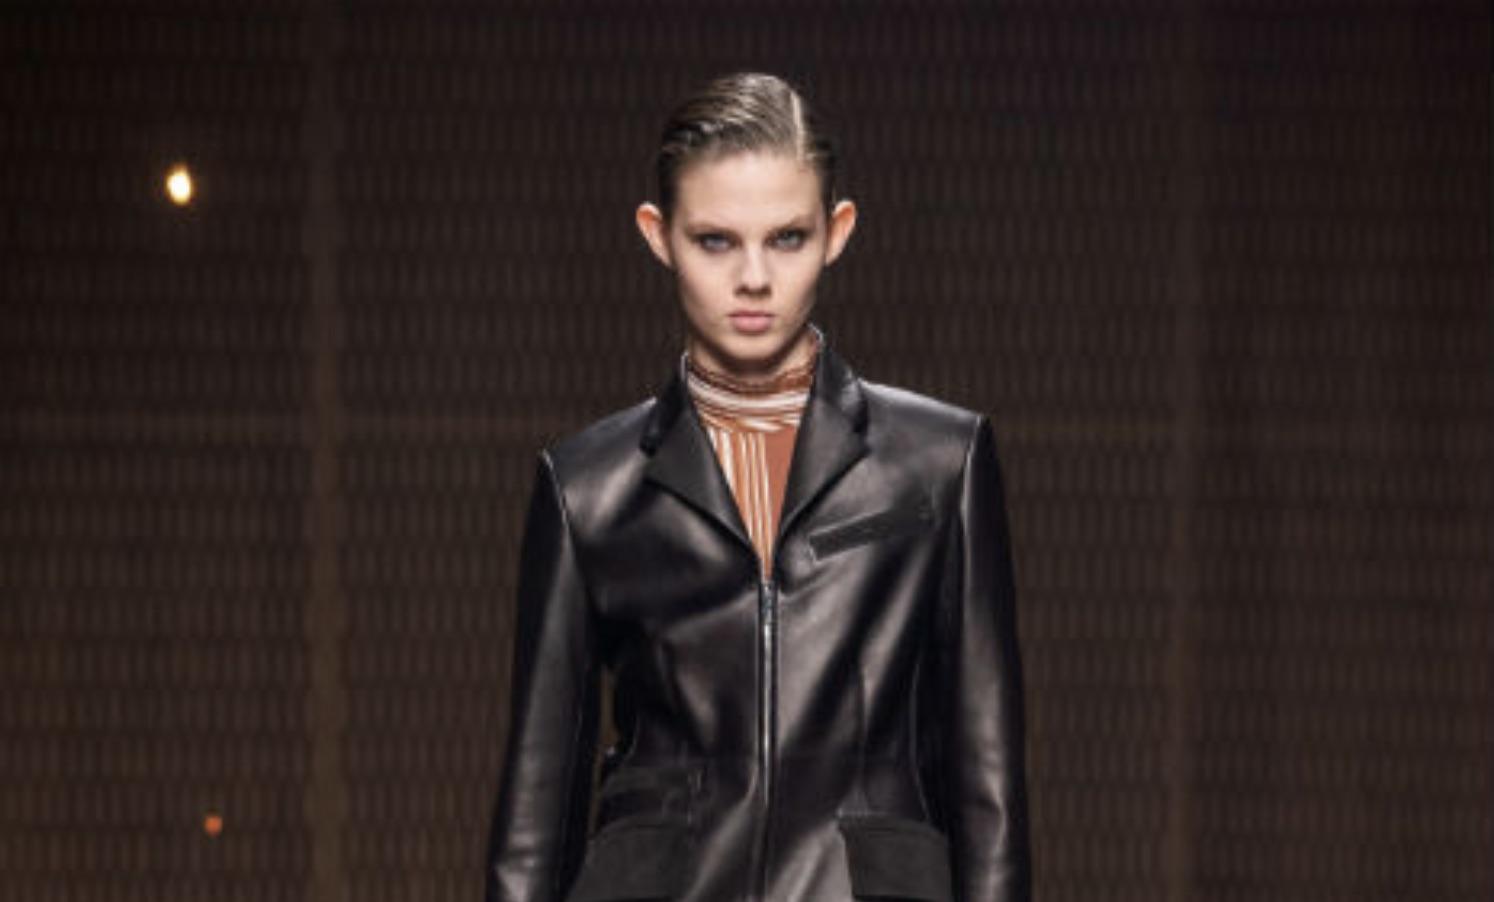 Watch The Hermès Autumn/Winter 19 Show at Paris Fashion Week